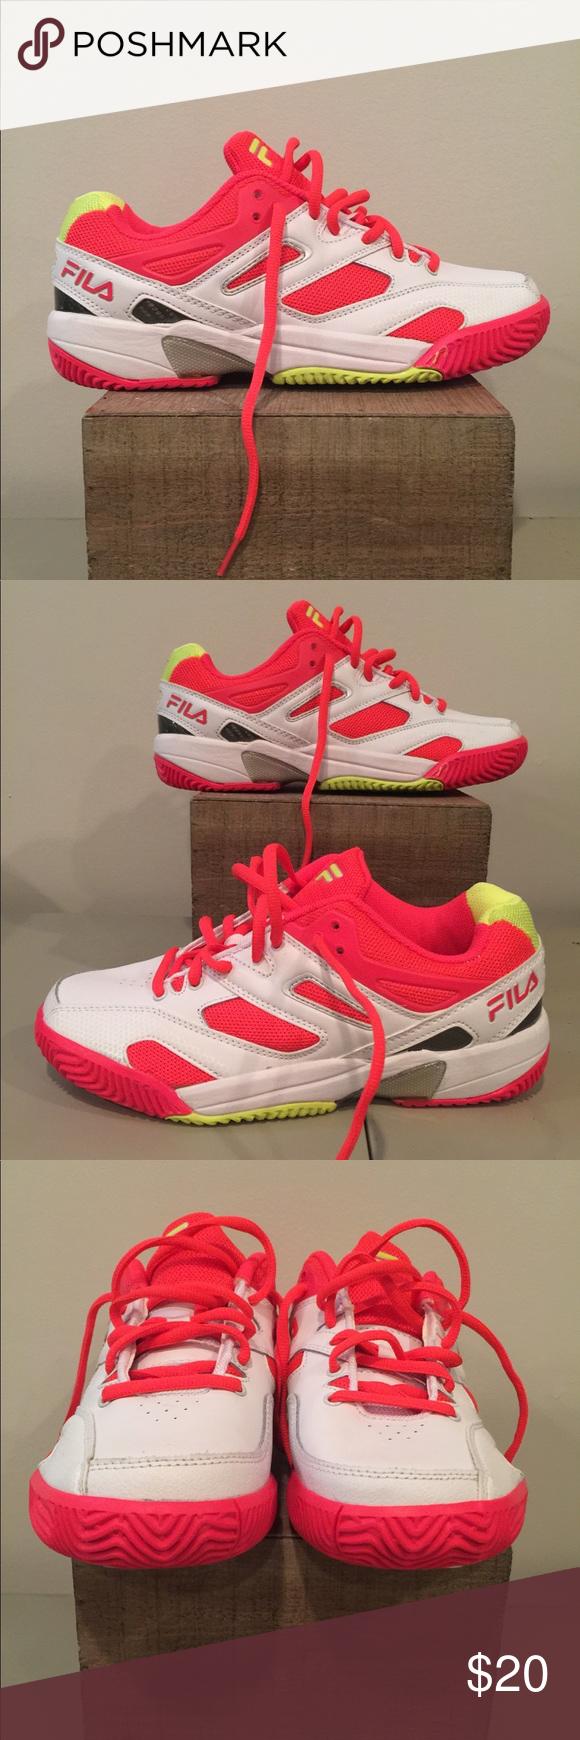 Fila Sentinel Junior Tennis Shoes Women's Like new condition